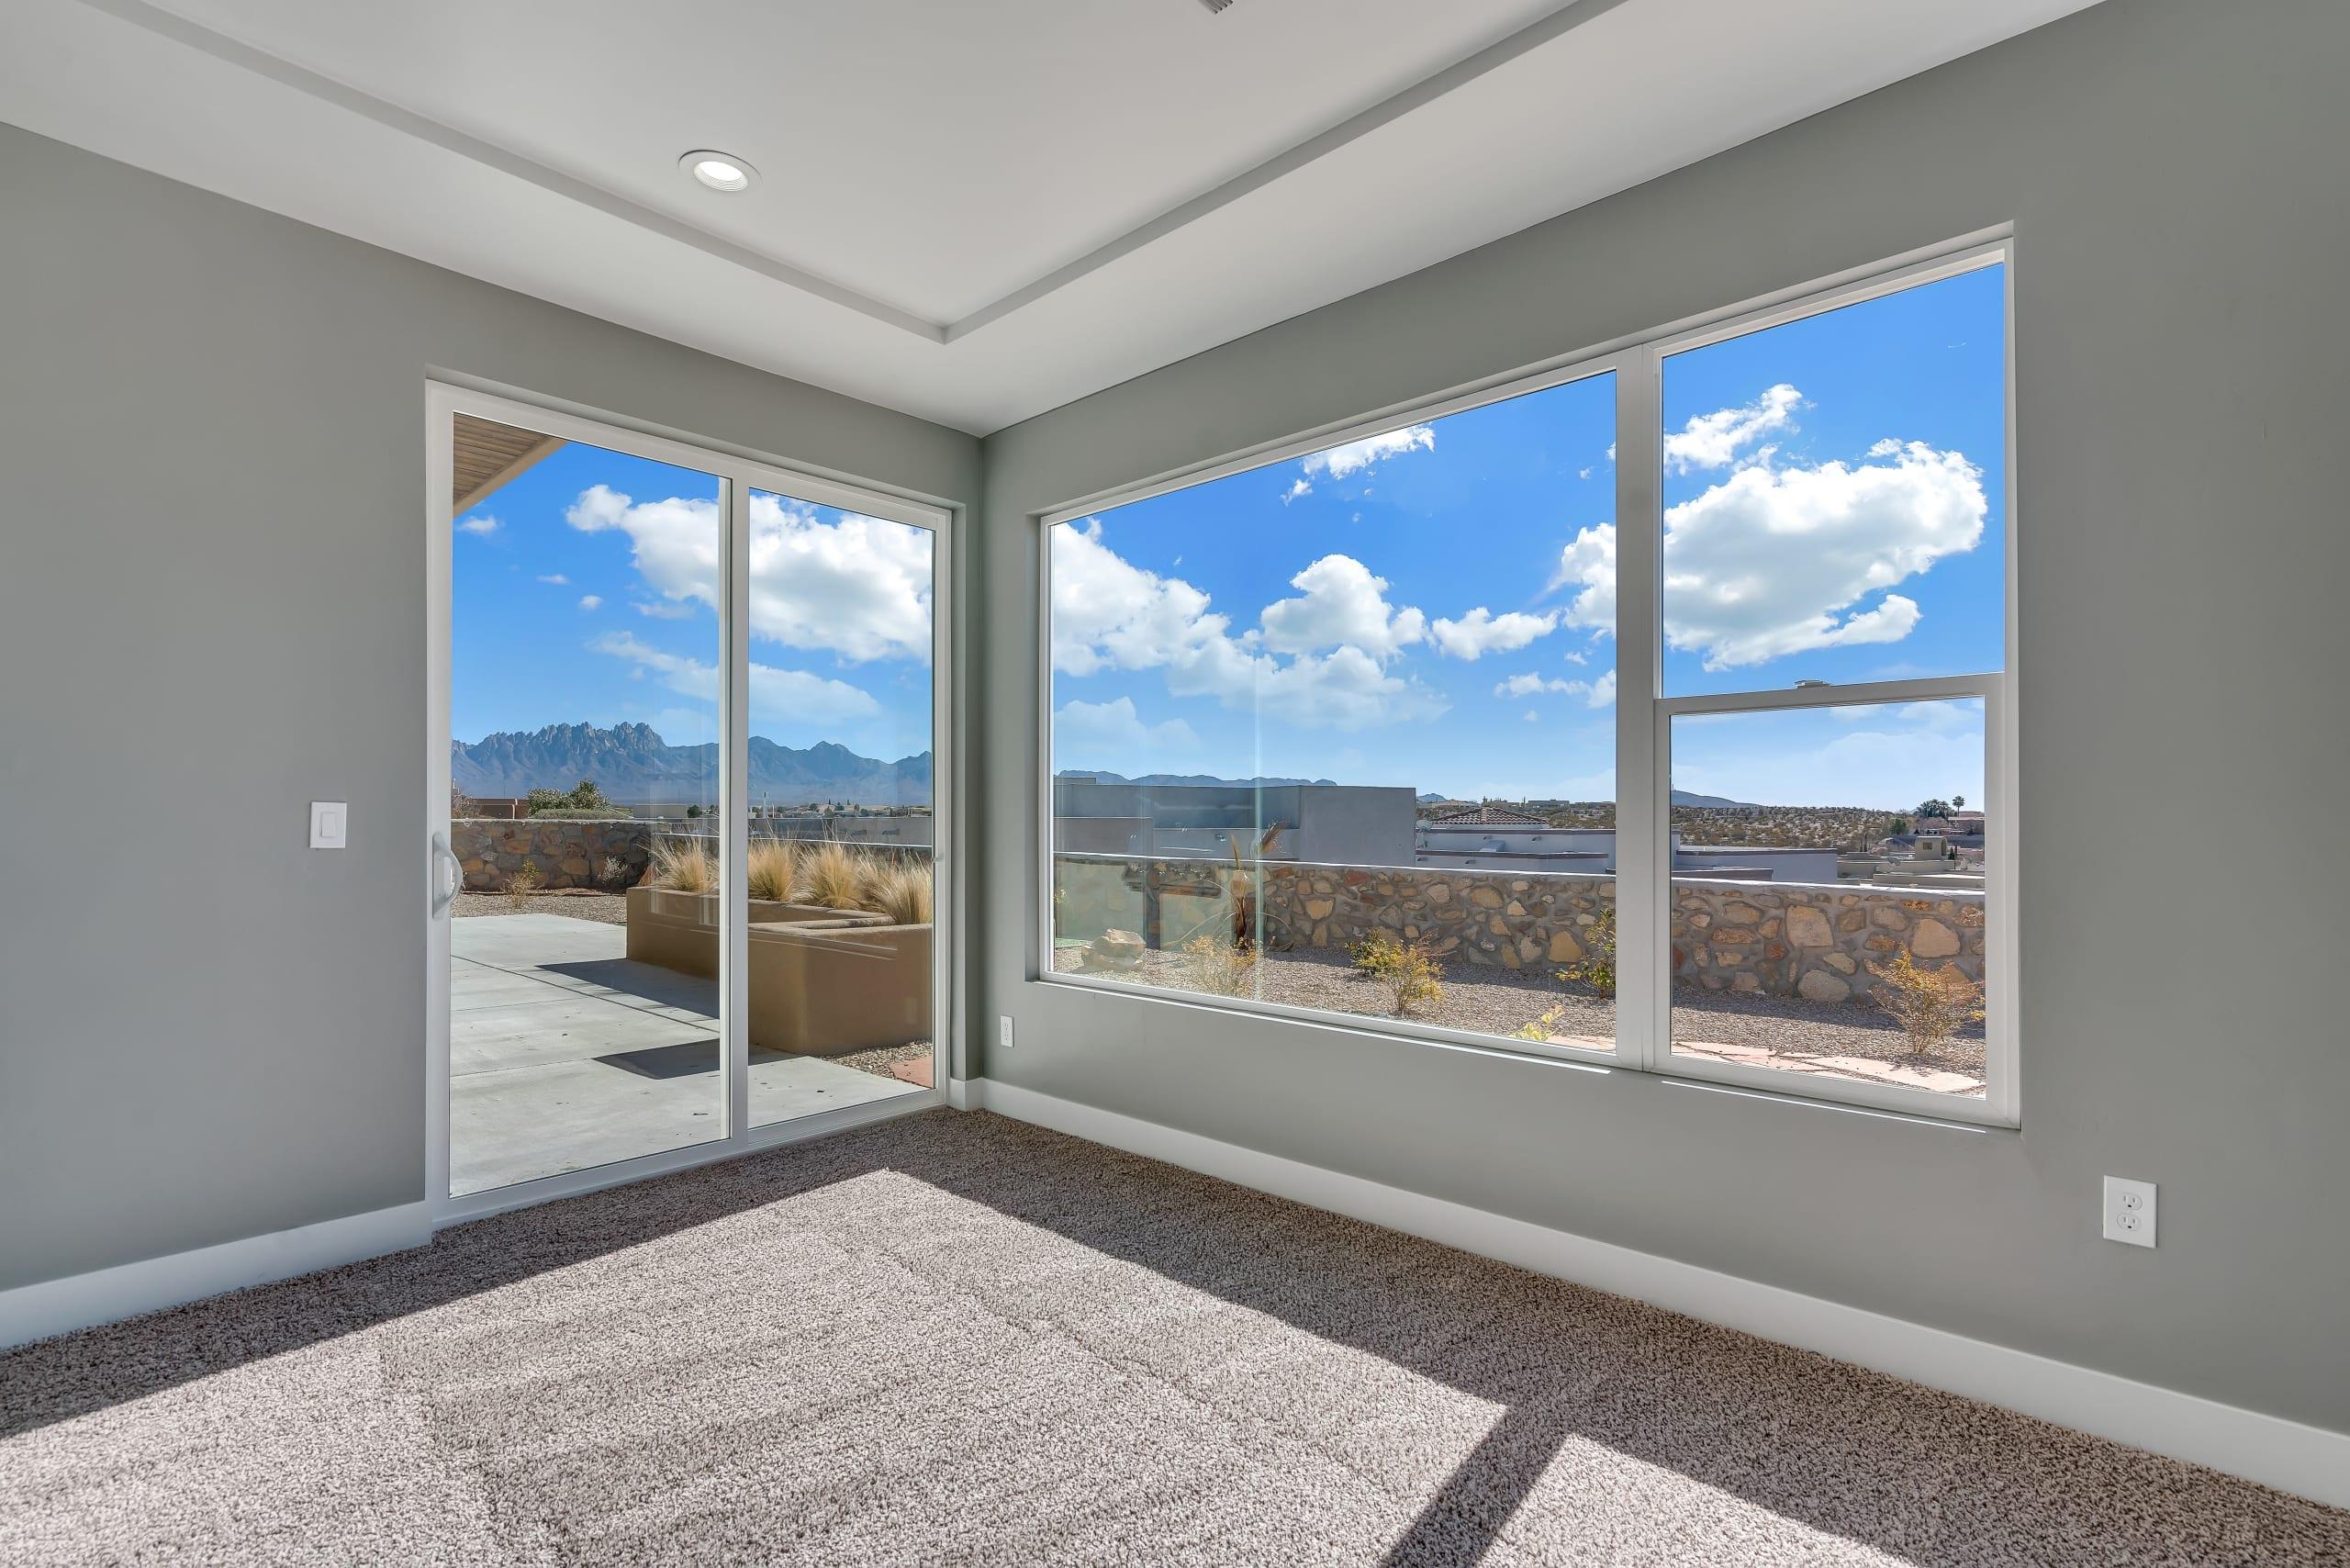 Master Bedroom - Large Windows - Sliding Door to Outside